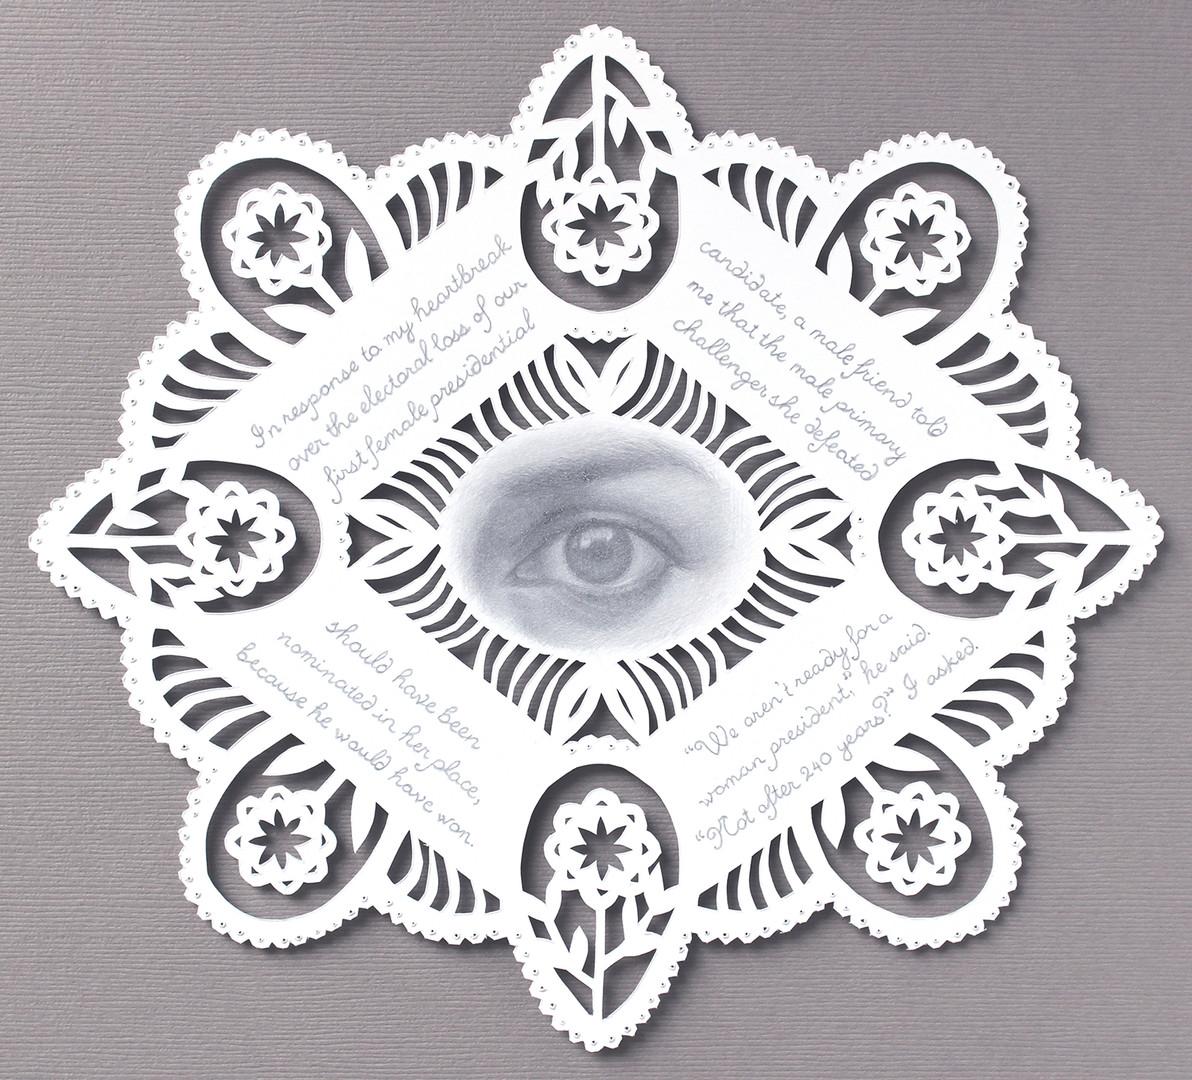 Corvelle_Lovers_Eye copy.jpg